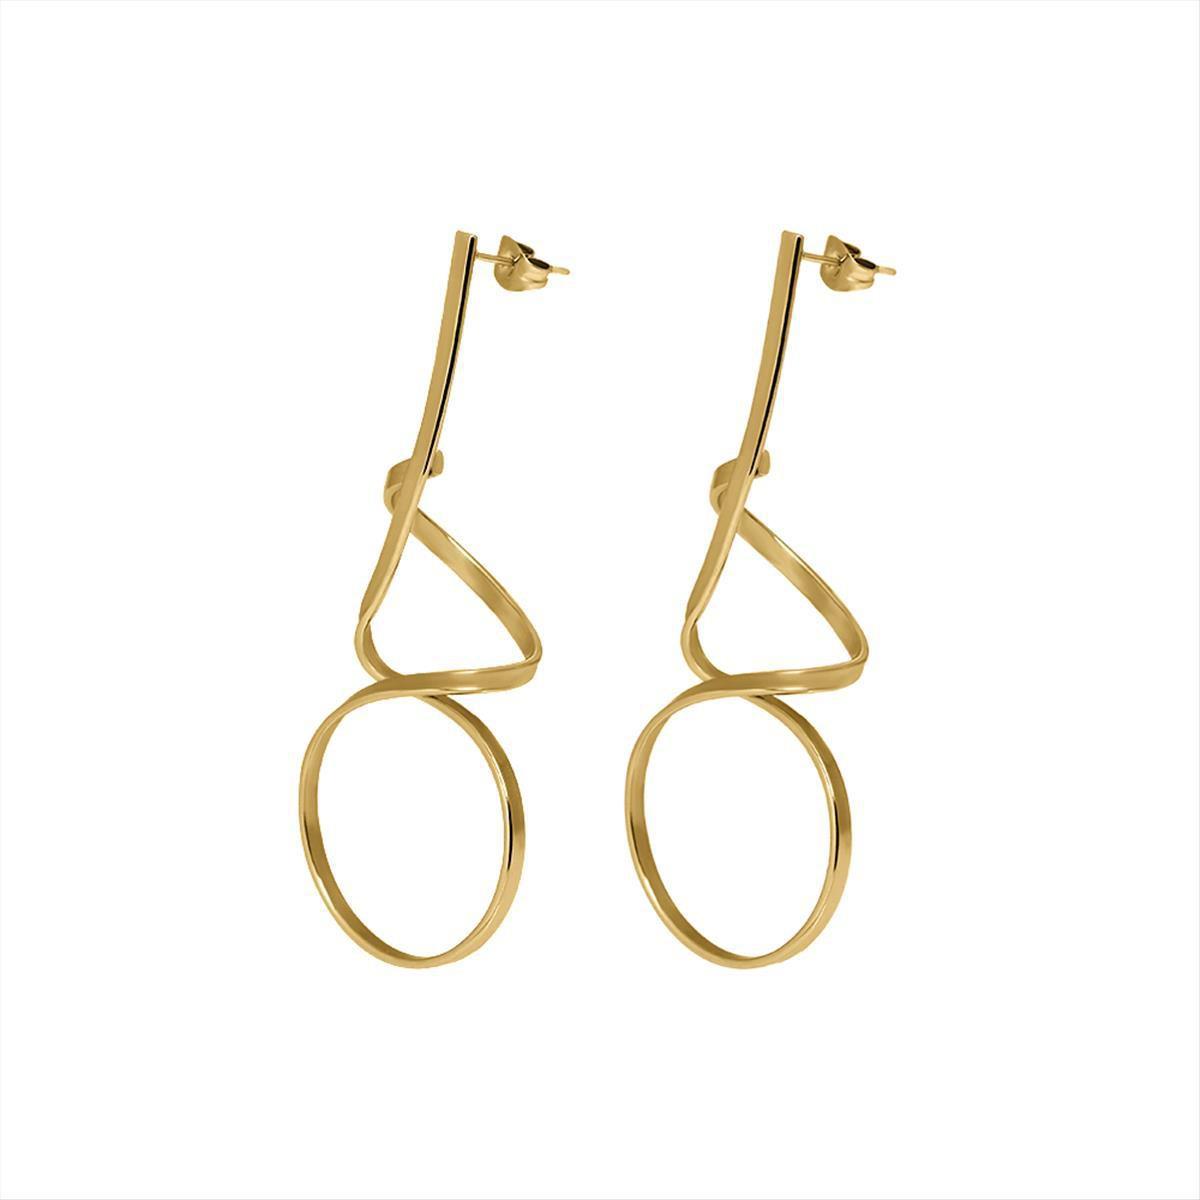 Boucles d'oreilles Edforce - 300-0162-E - Modalova